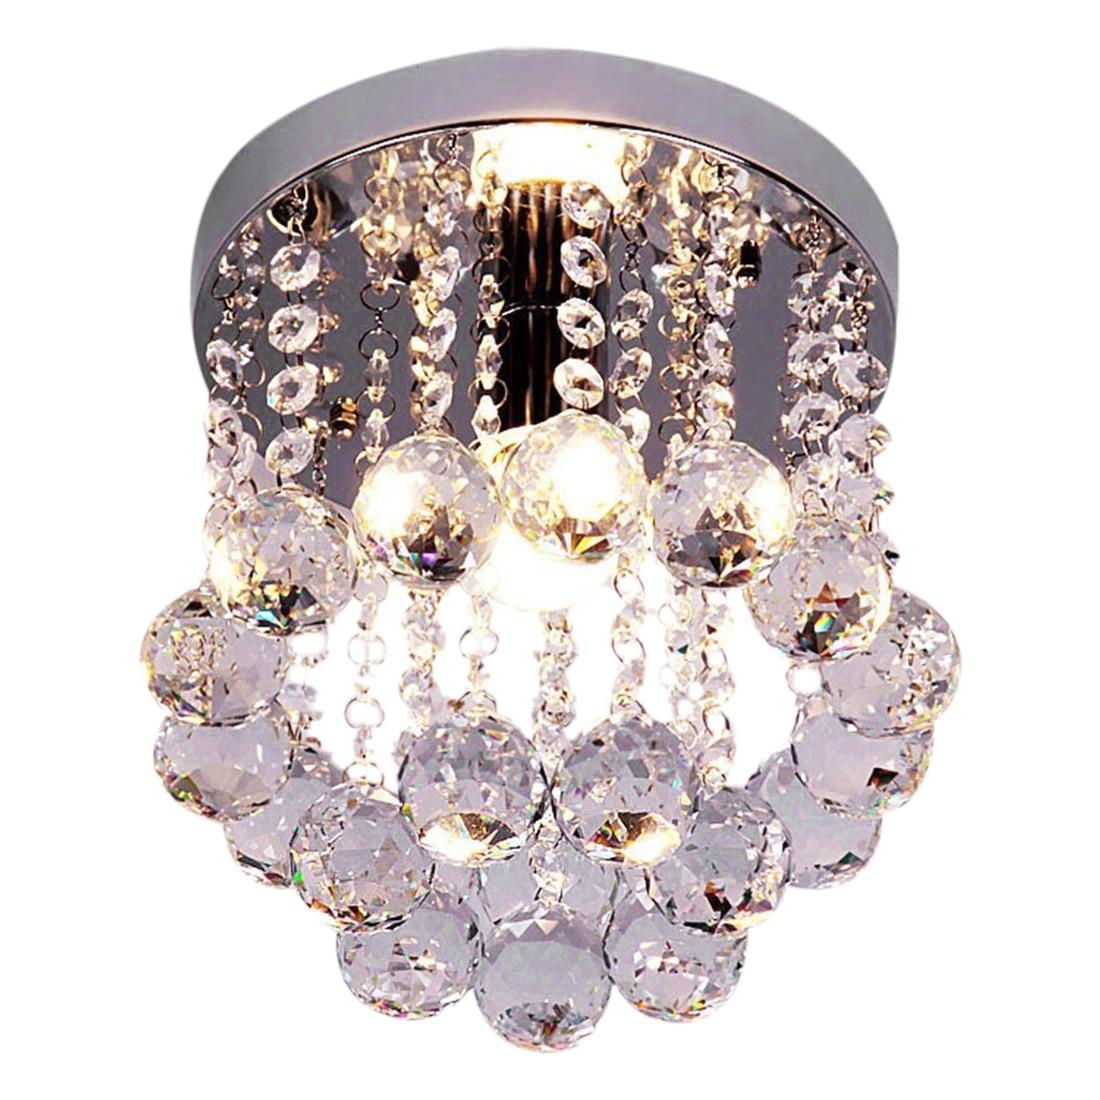 LICG-Retro Luxury Flush Mount Crystal Pendant Ceiling Light Chandelier Lighting HQLICG-Retro Luxury Flush Mount Crystal Pendant Ceiling Light Chandelier Lighting HQ